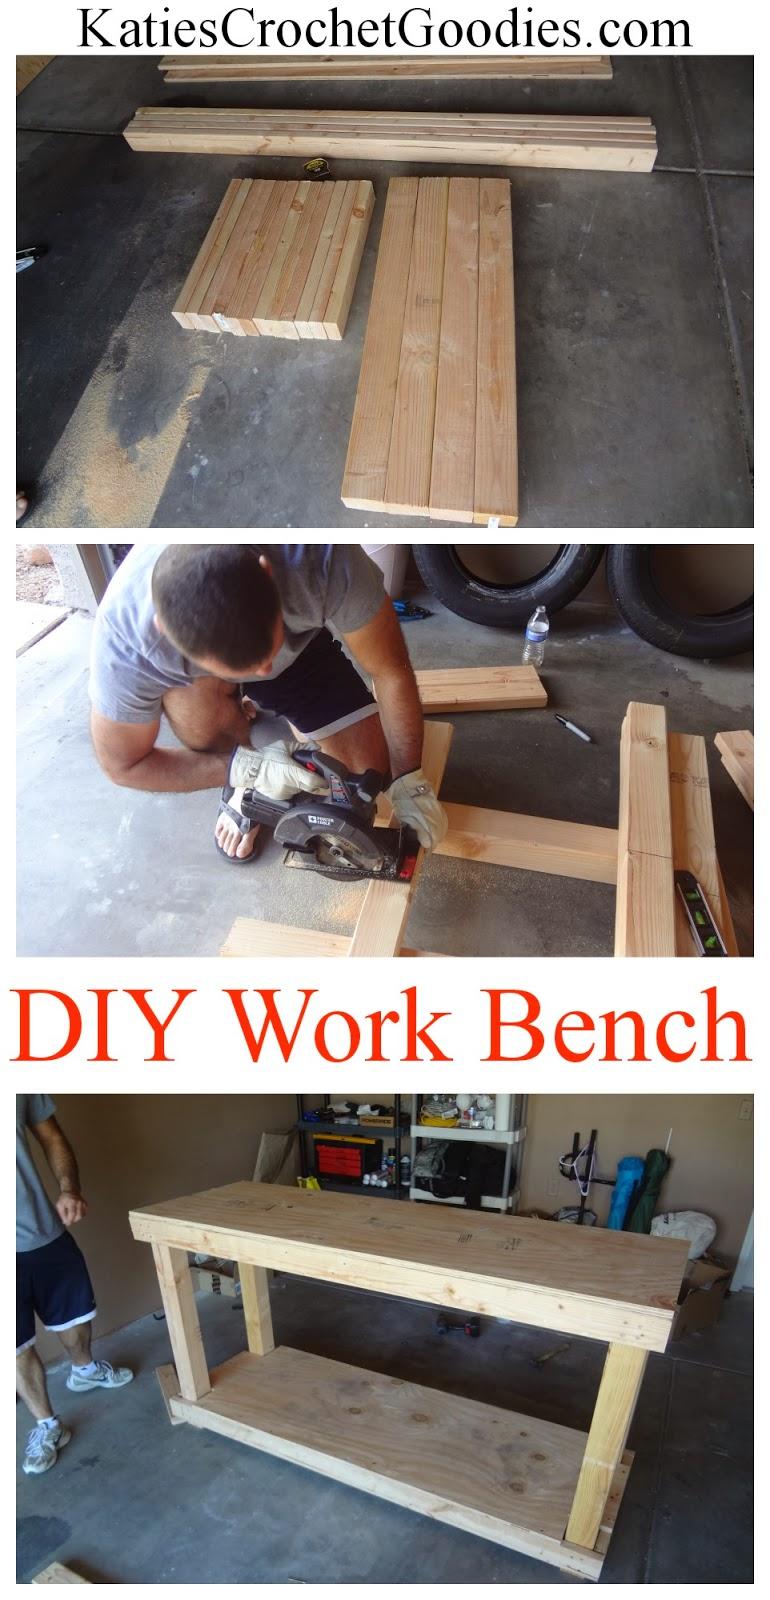 diy work bench tutorial